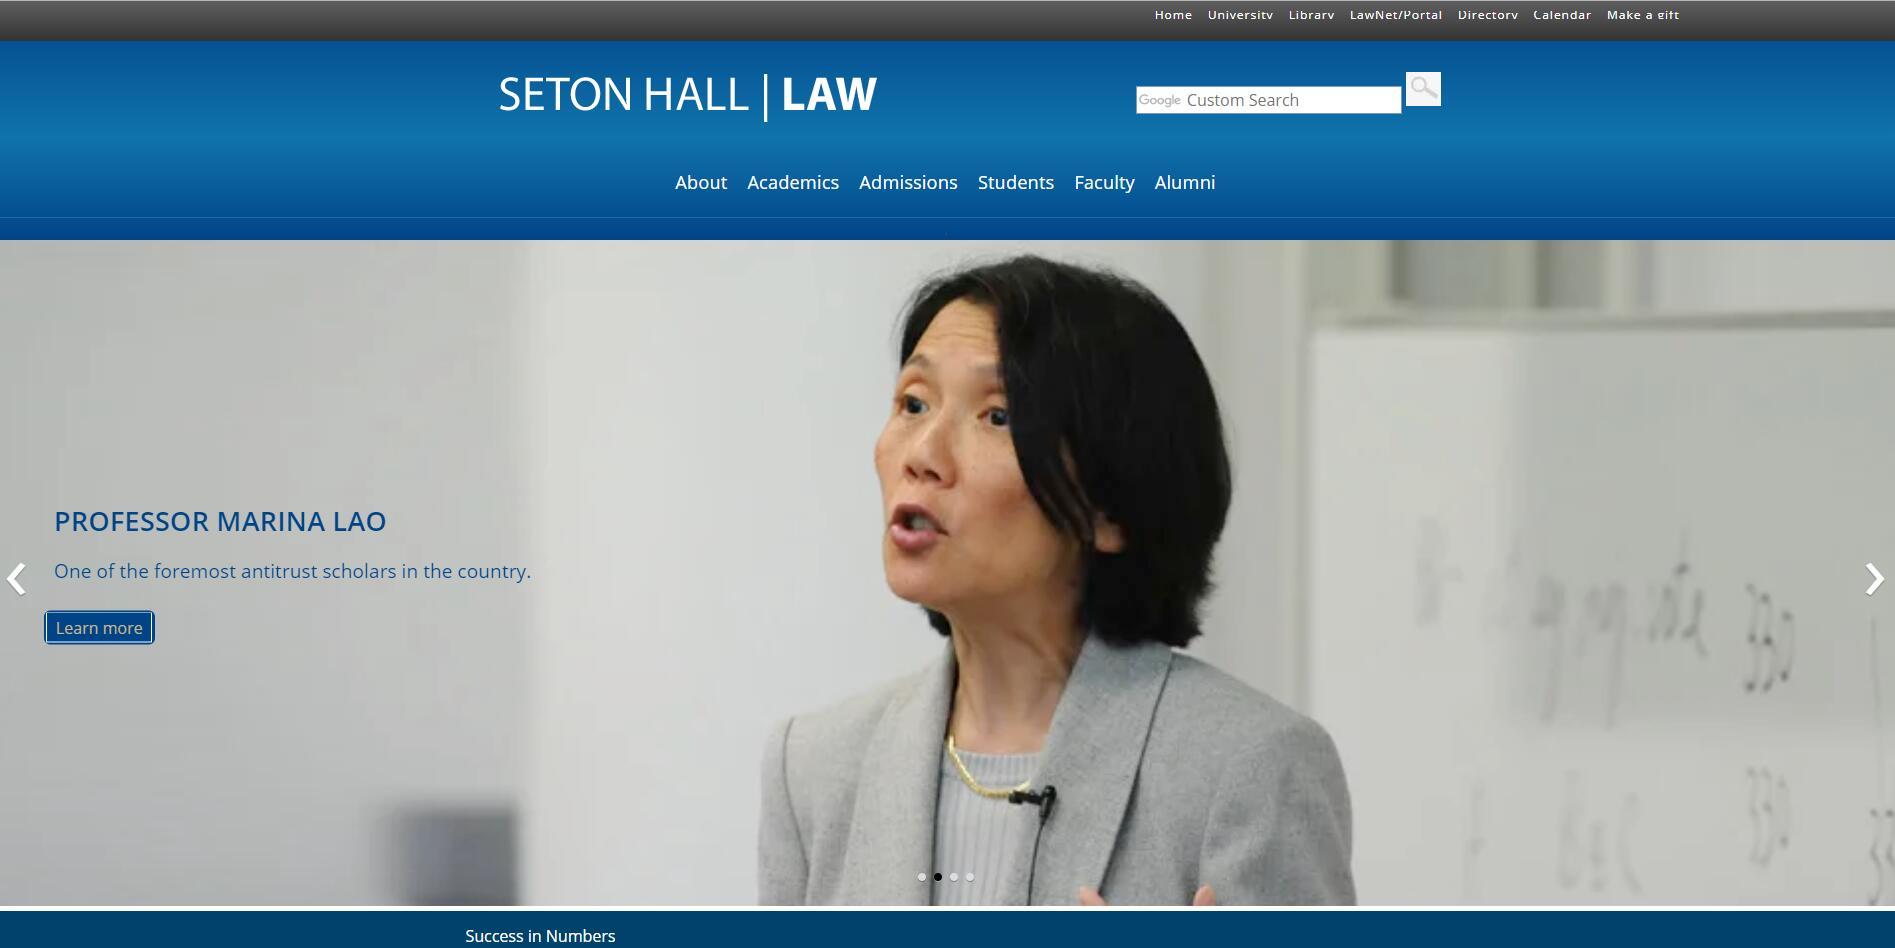 The School of Law at Seton Hall University